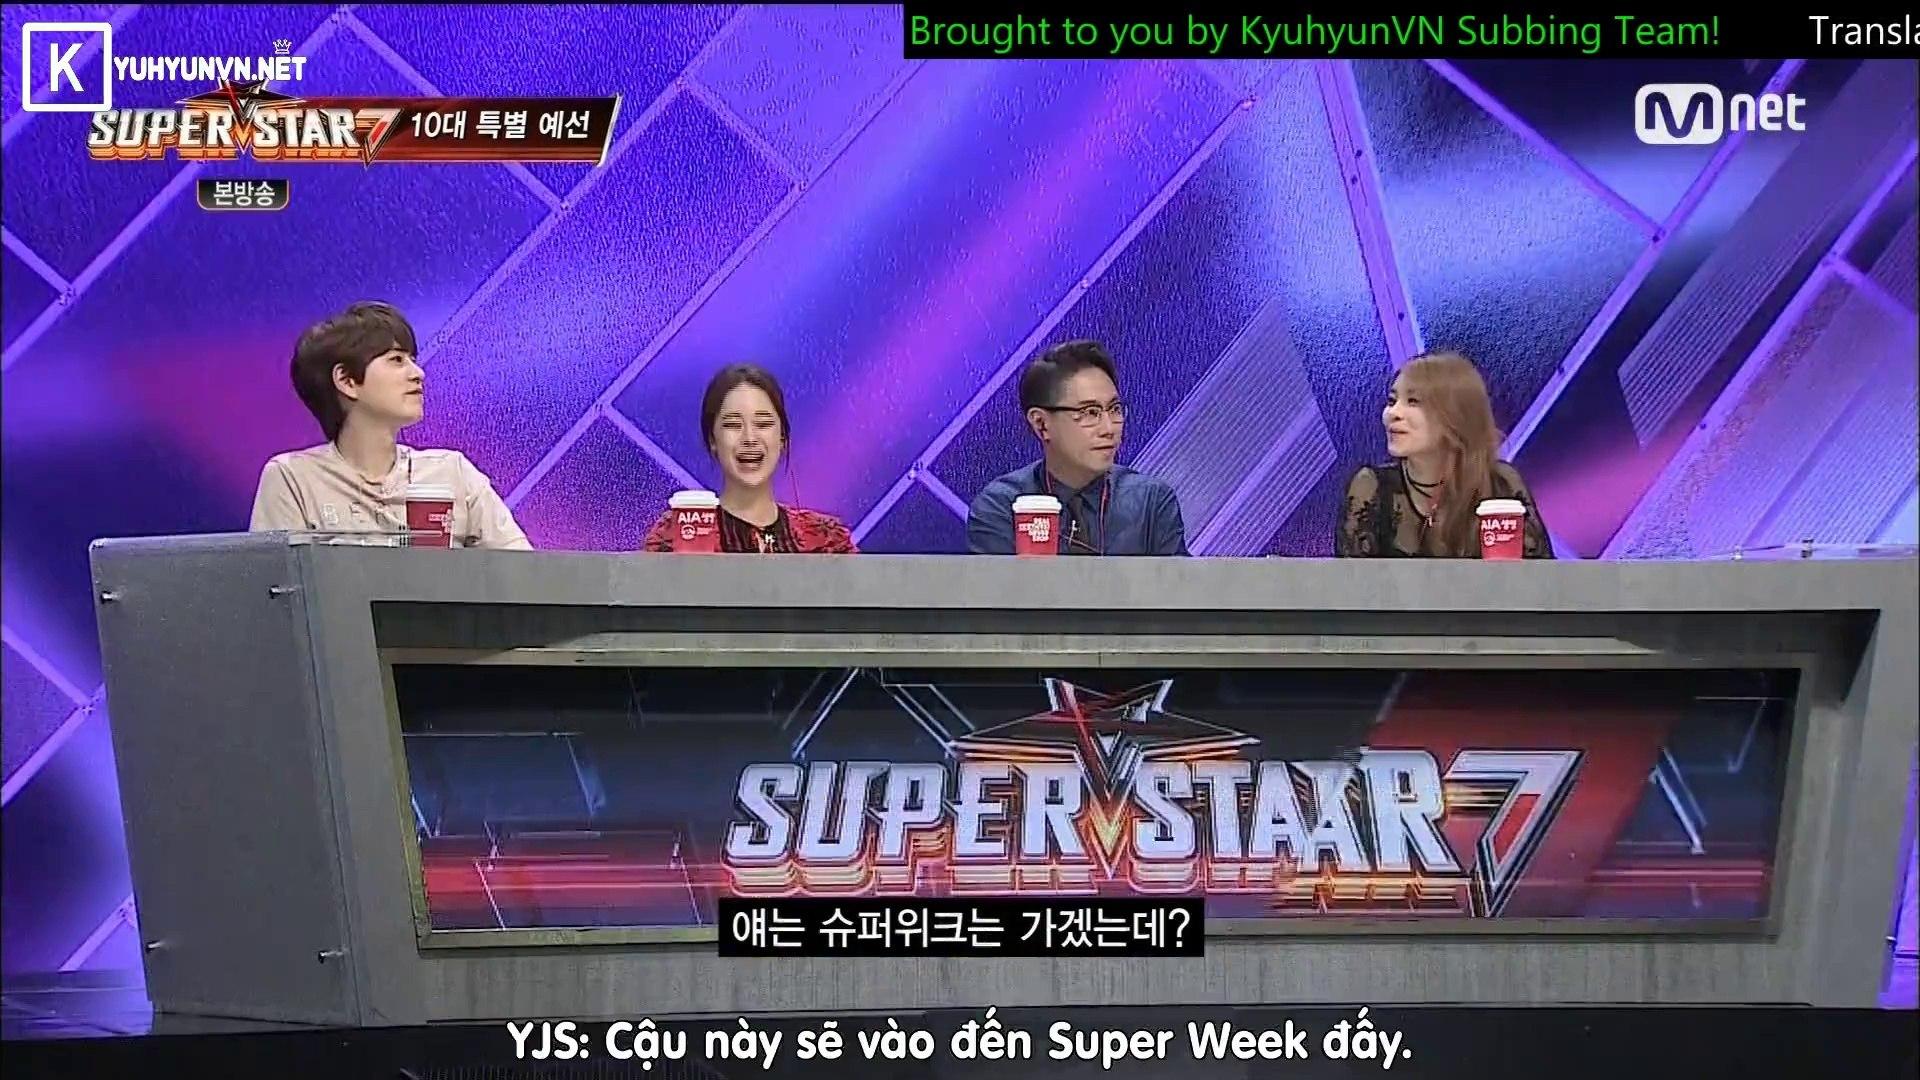 [Vietsub] 150827 SuperStarK7 - Kyuhyun cut